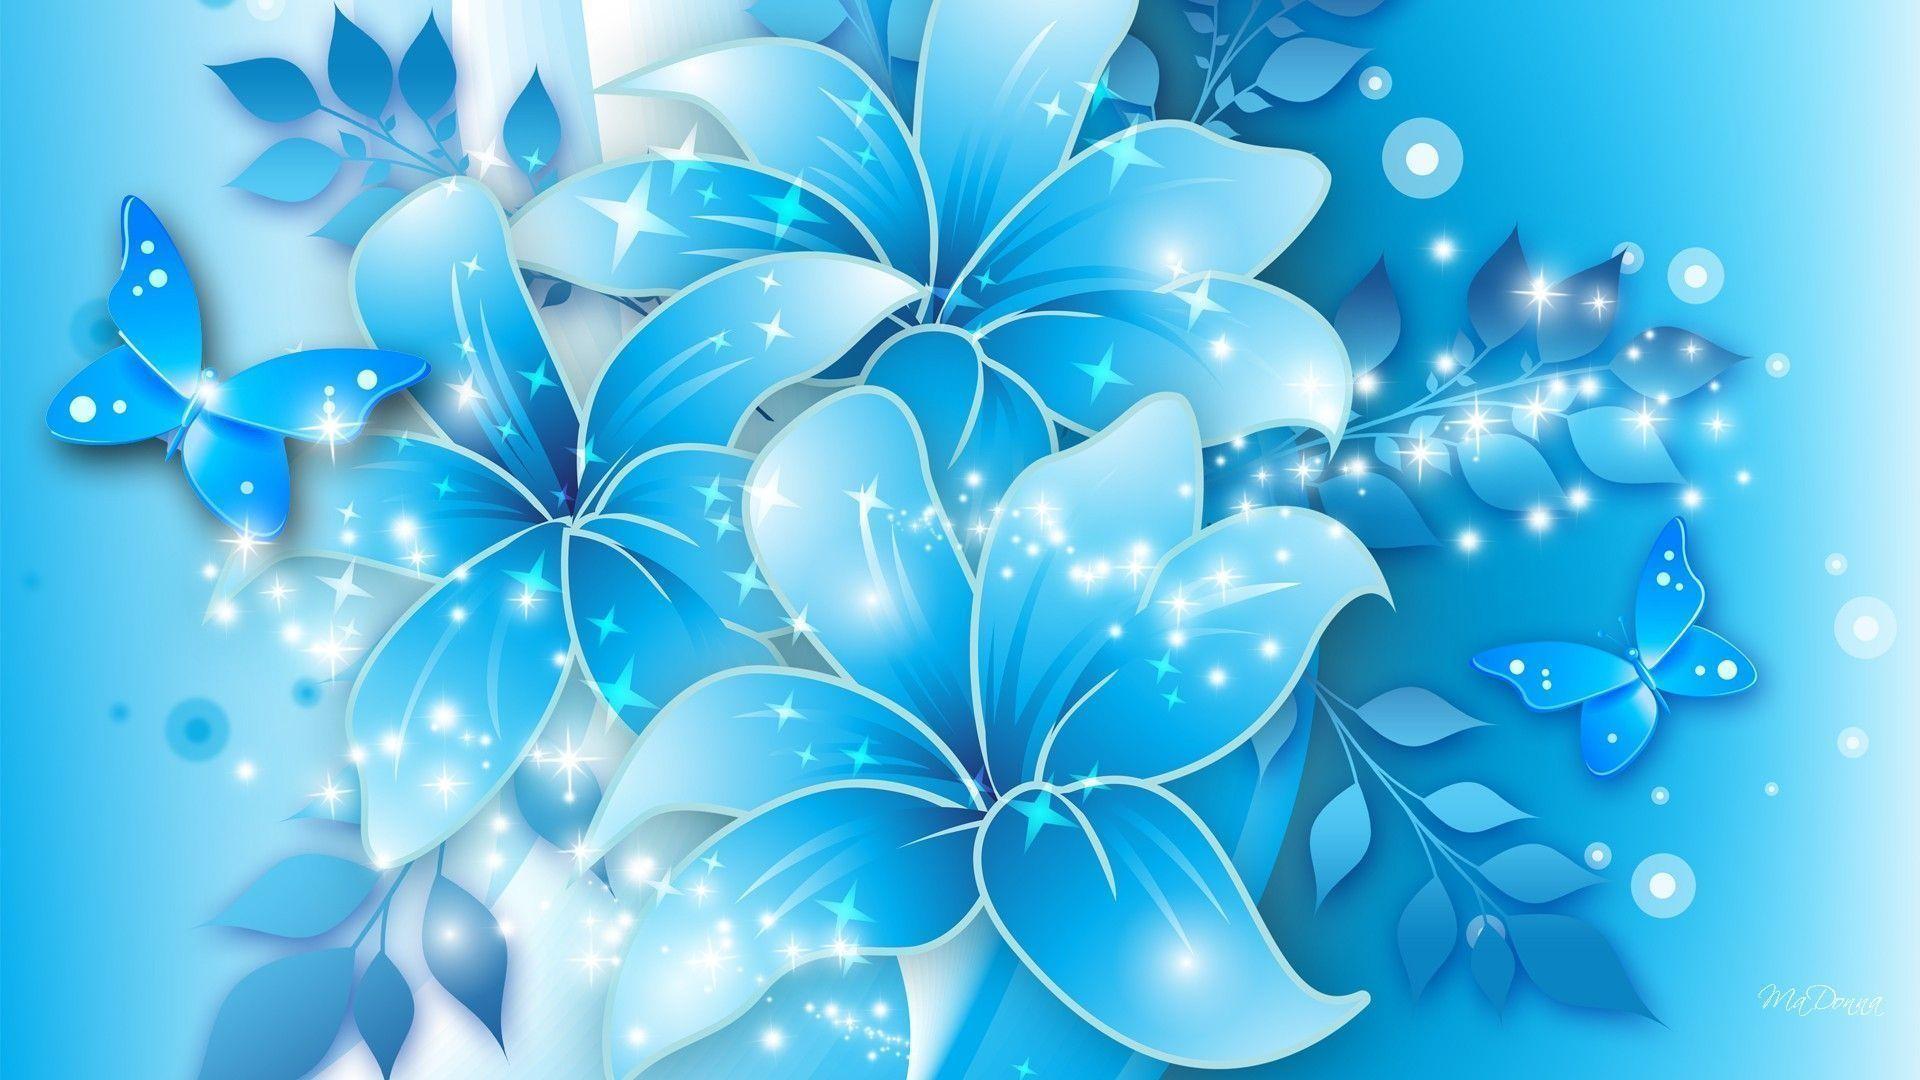 Light Blue Floral Wallpaper HD – dlwallhd.